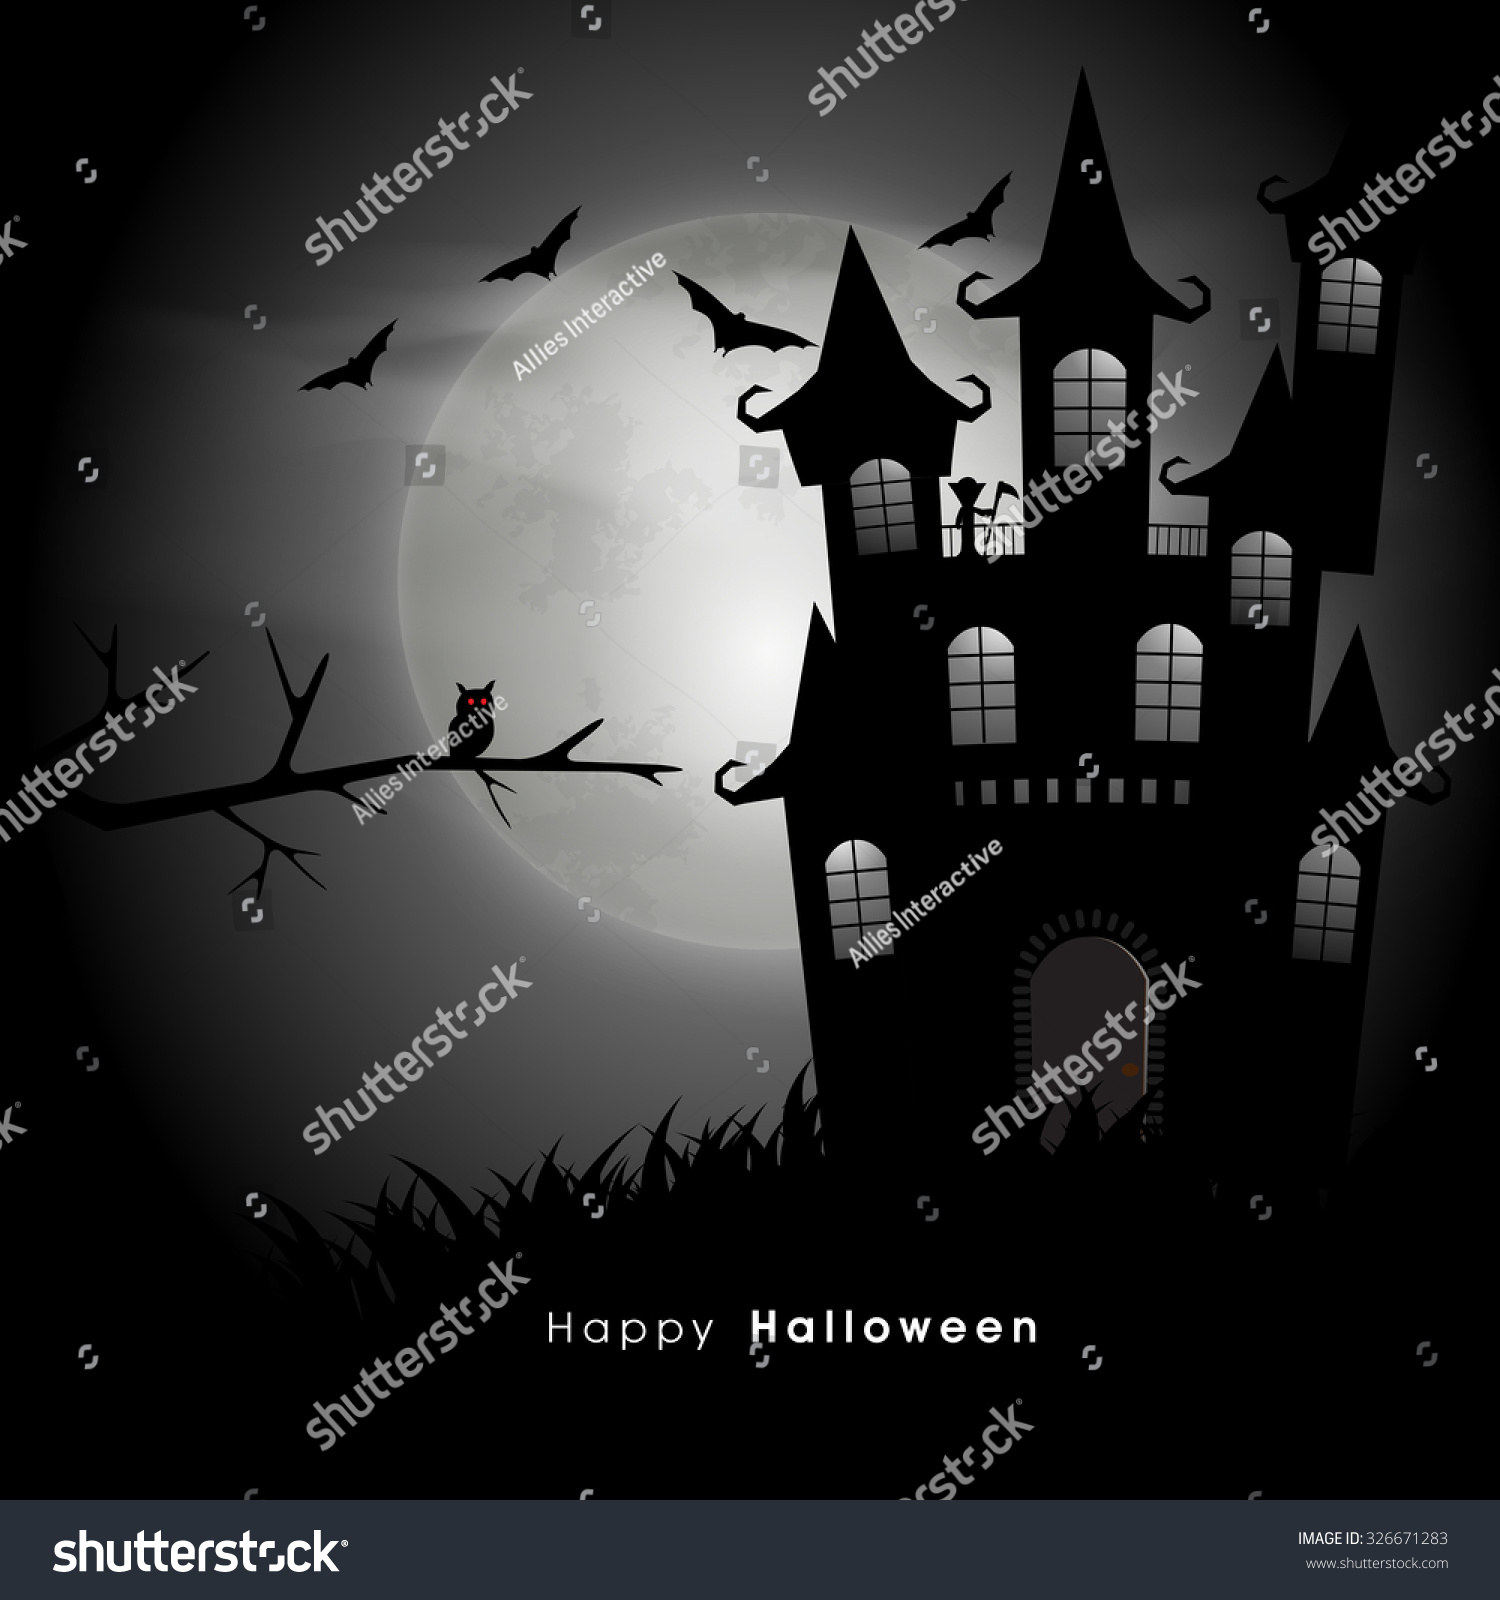 Happy Halloween Party Celebration Scary Haunted Stock Vector ...